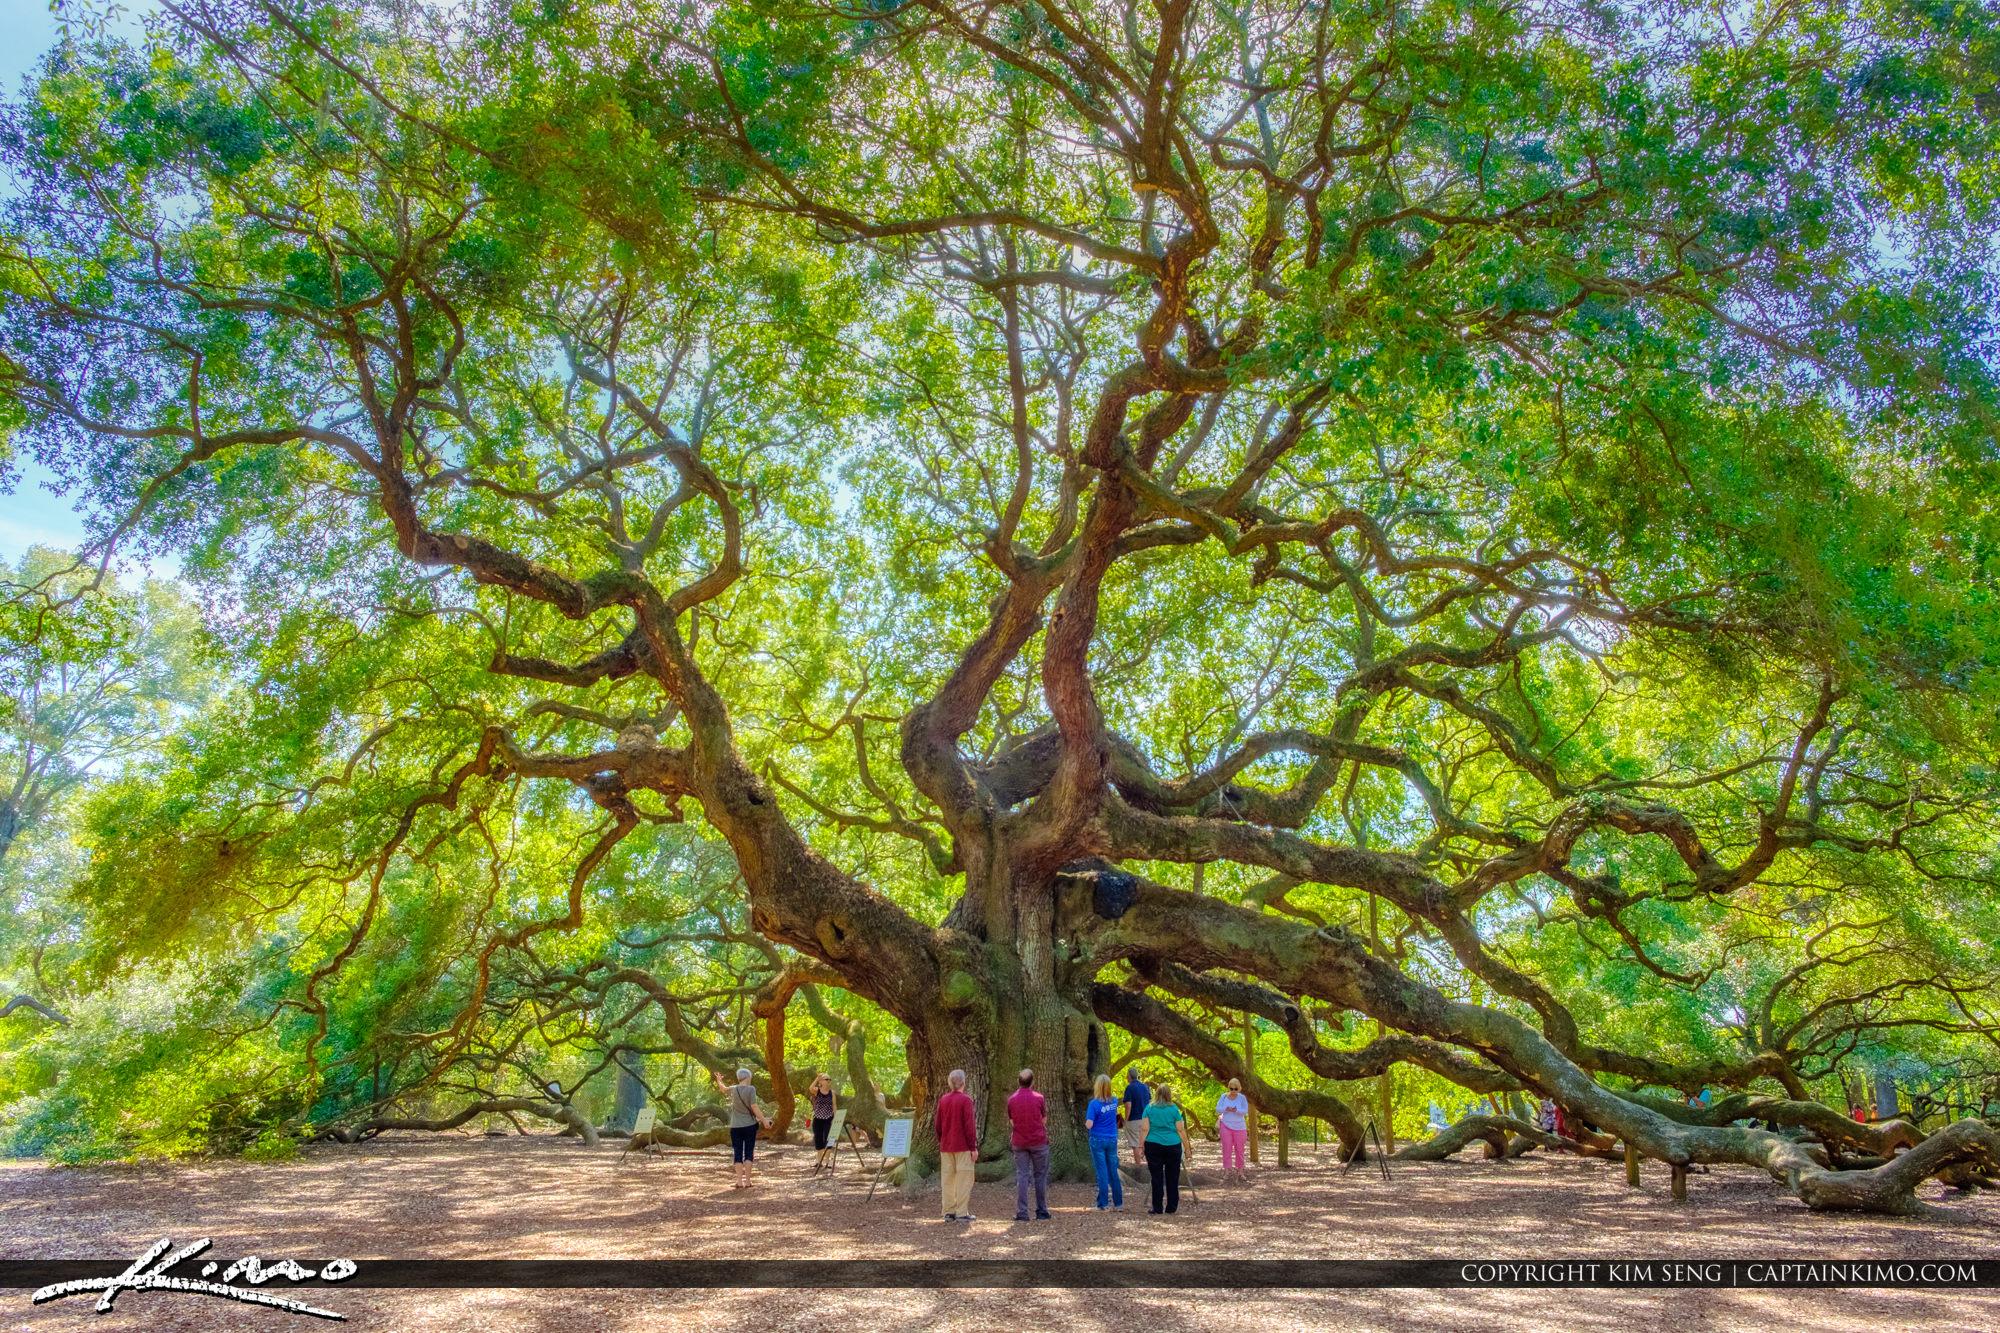 South Carolina Angel Oak Tree People at Trunk